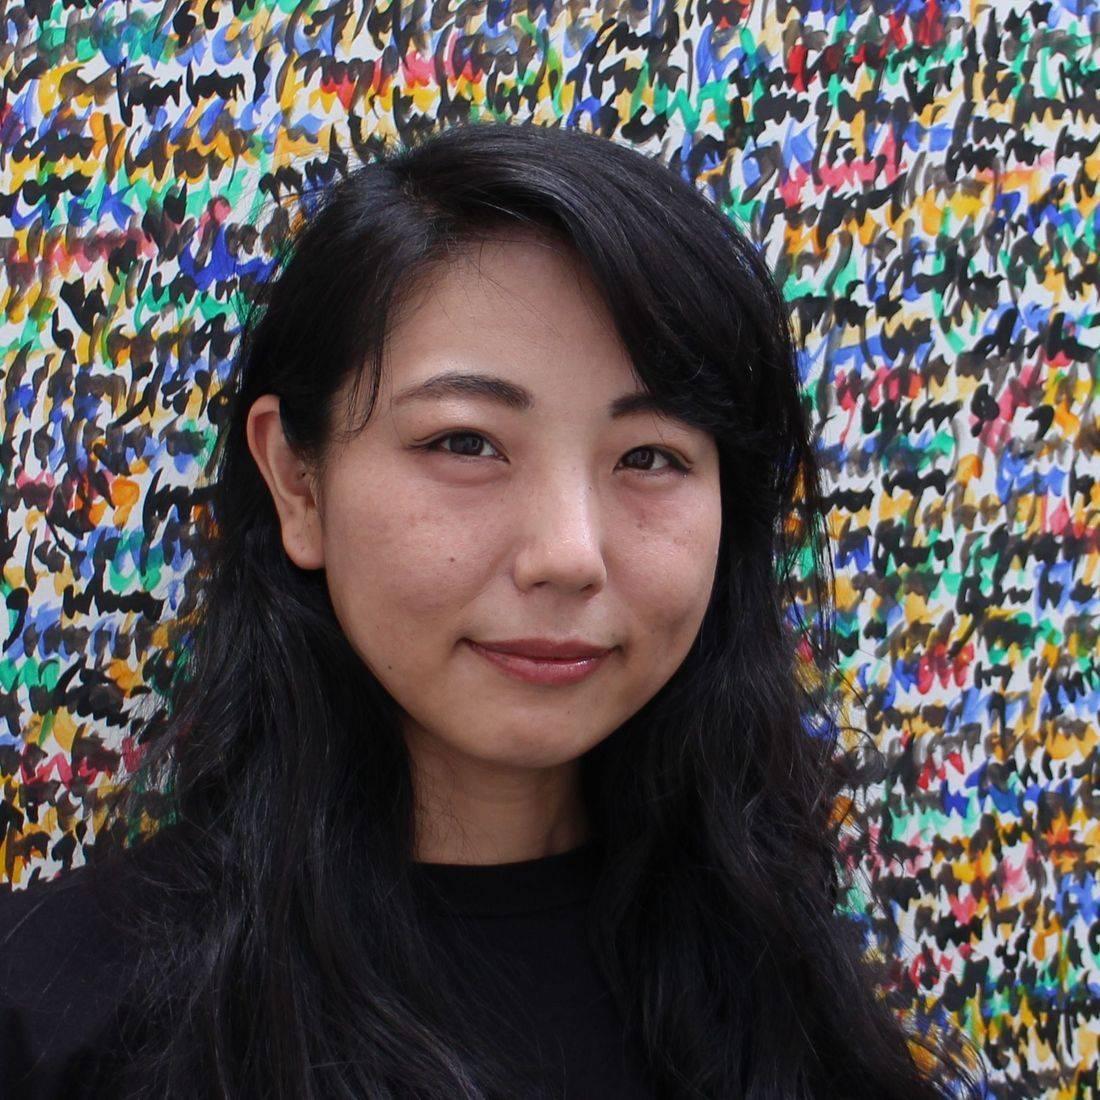 tanuma yoshi ヨシ グラフィティ ヘア ロンドン 美容院 美容室 日系 graffiti hair studio 口コミ